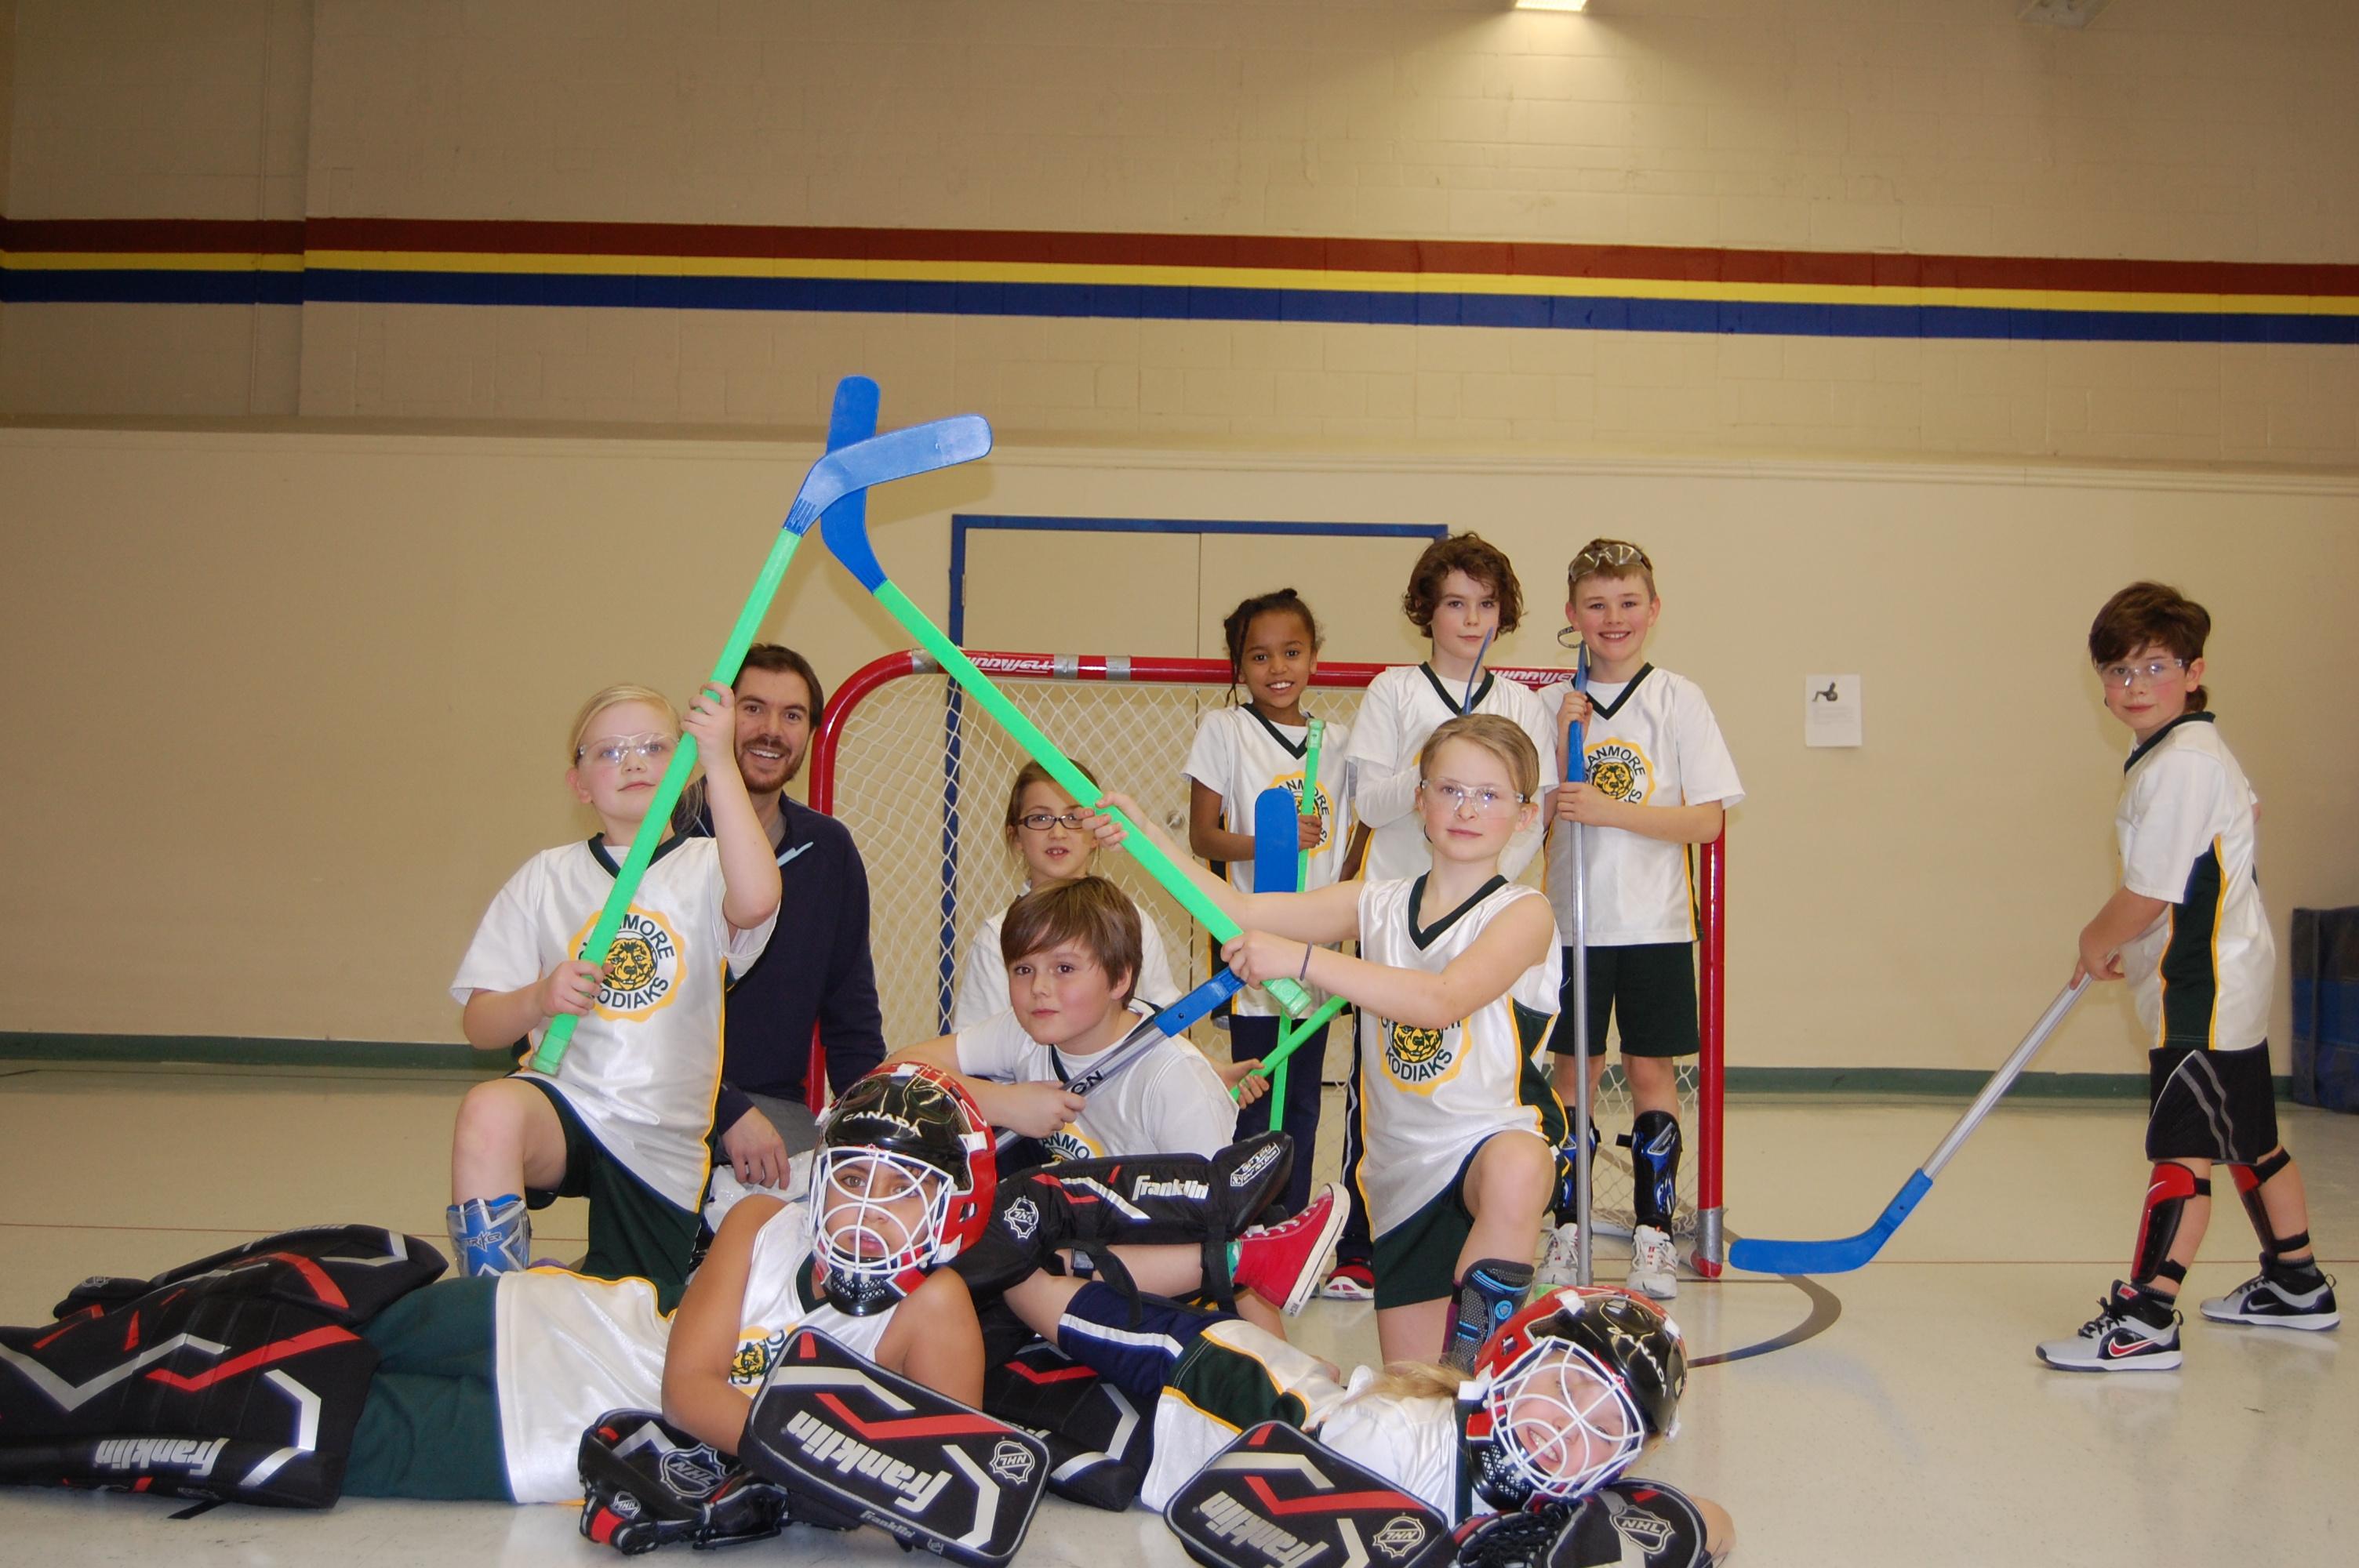 Clanmore Montessori Attends Pssa Floor Hockey Tournament